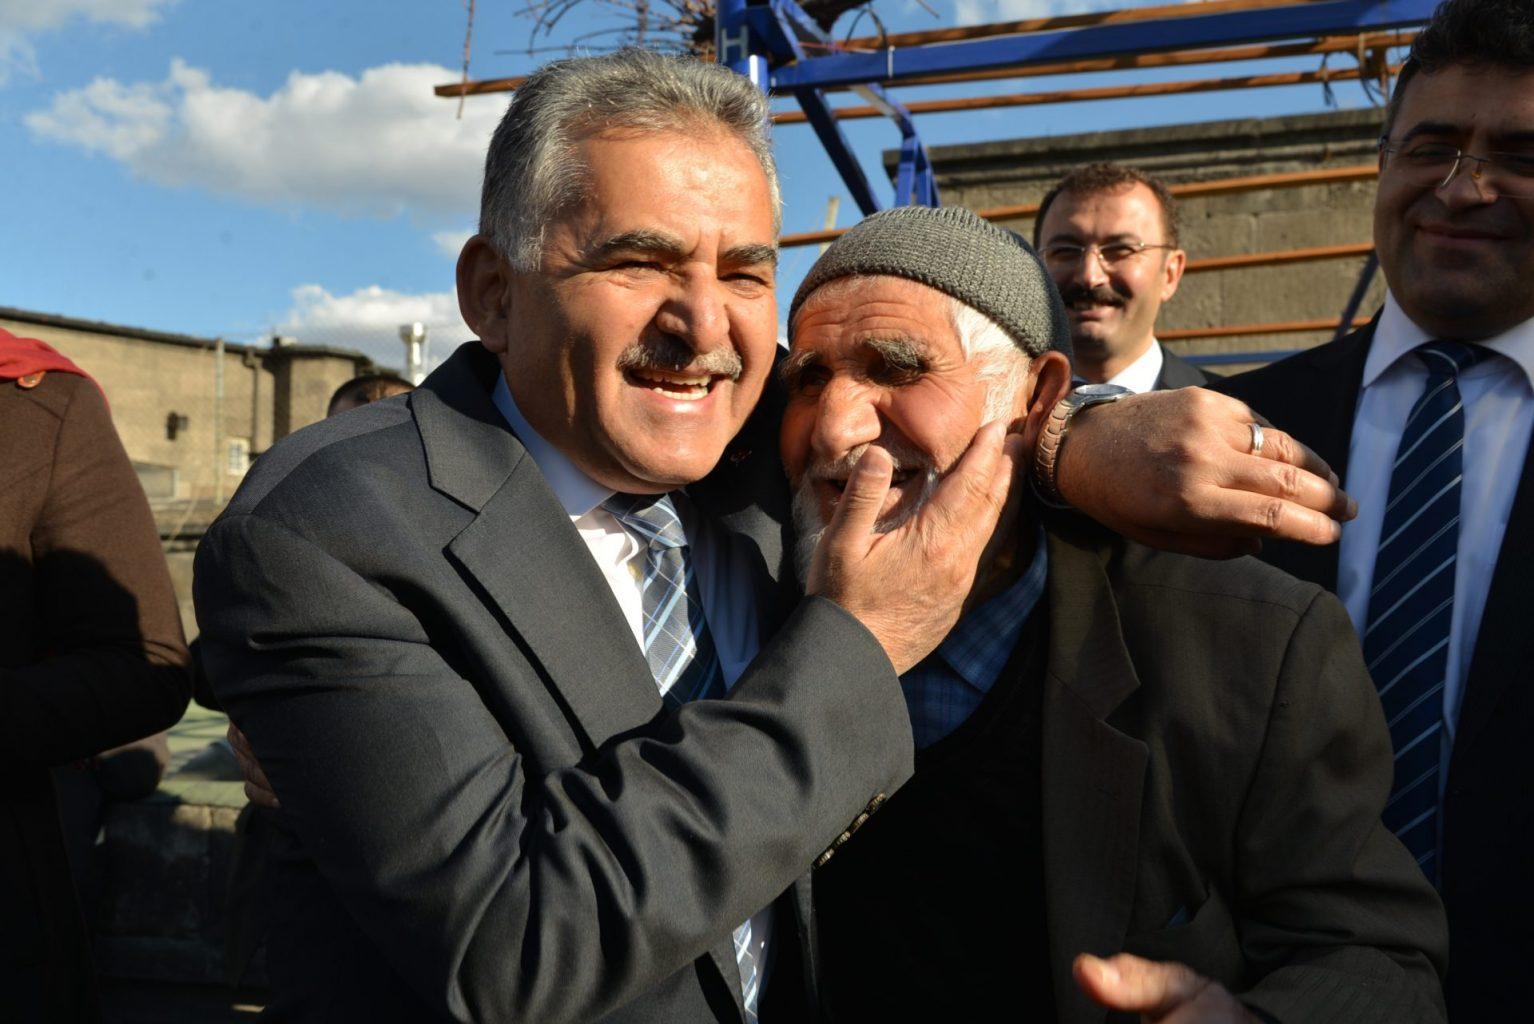 O bir kent doktoru Dr.Memduh Büyükkılıç ozelkalem.com .tr 2